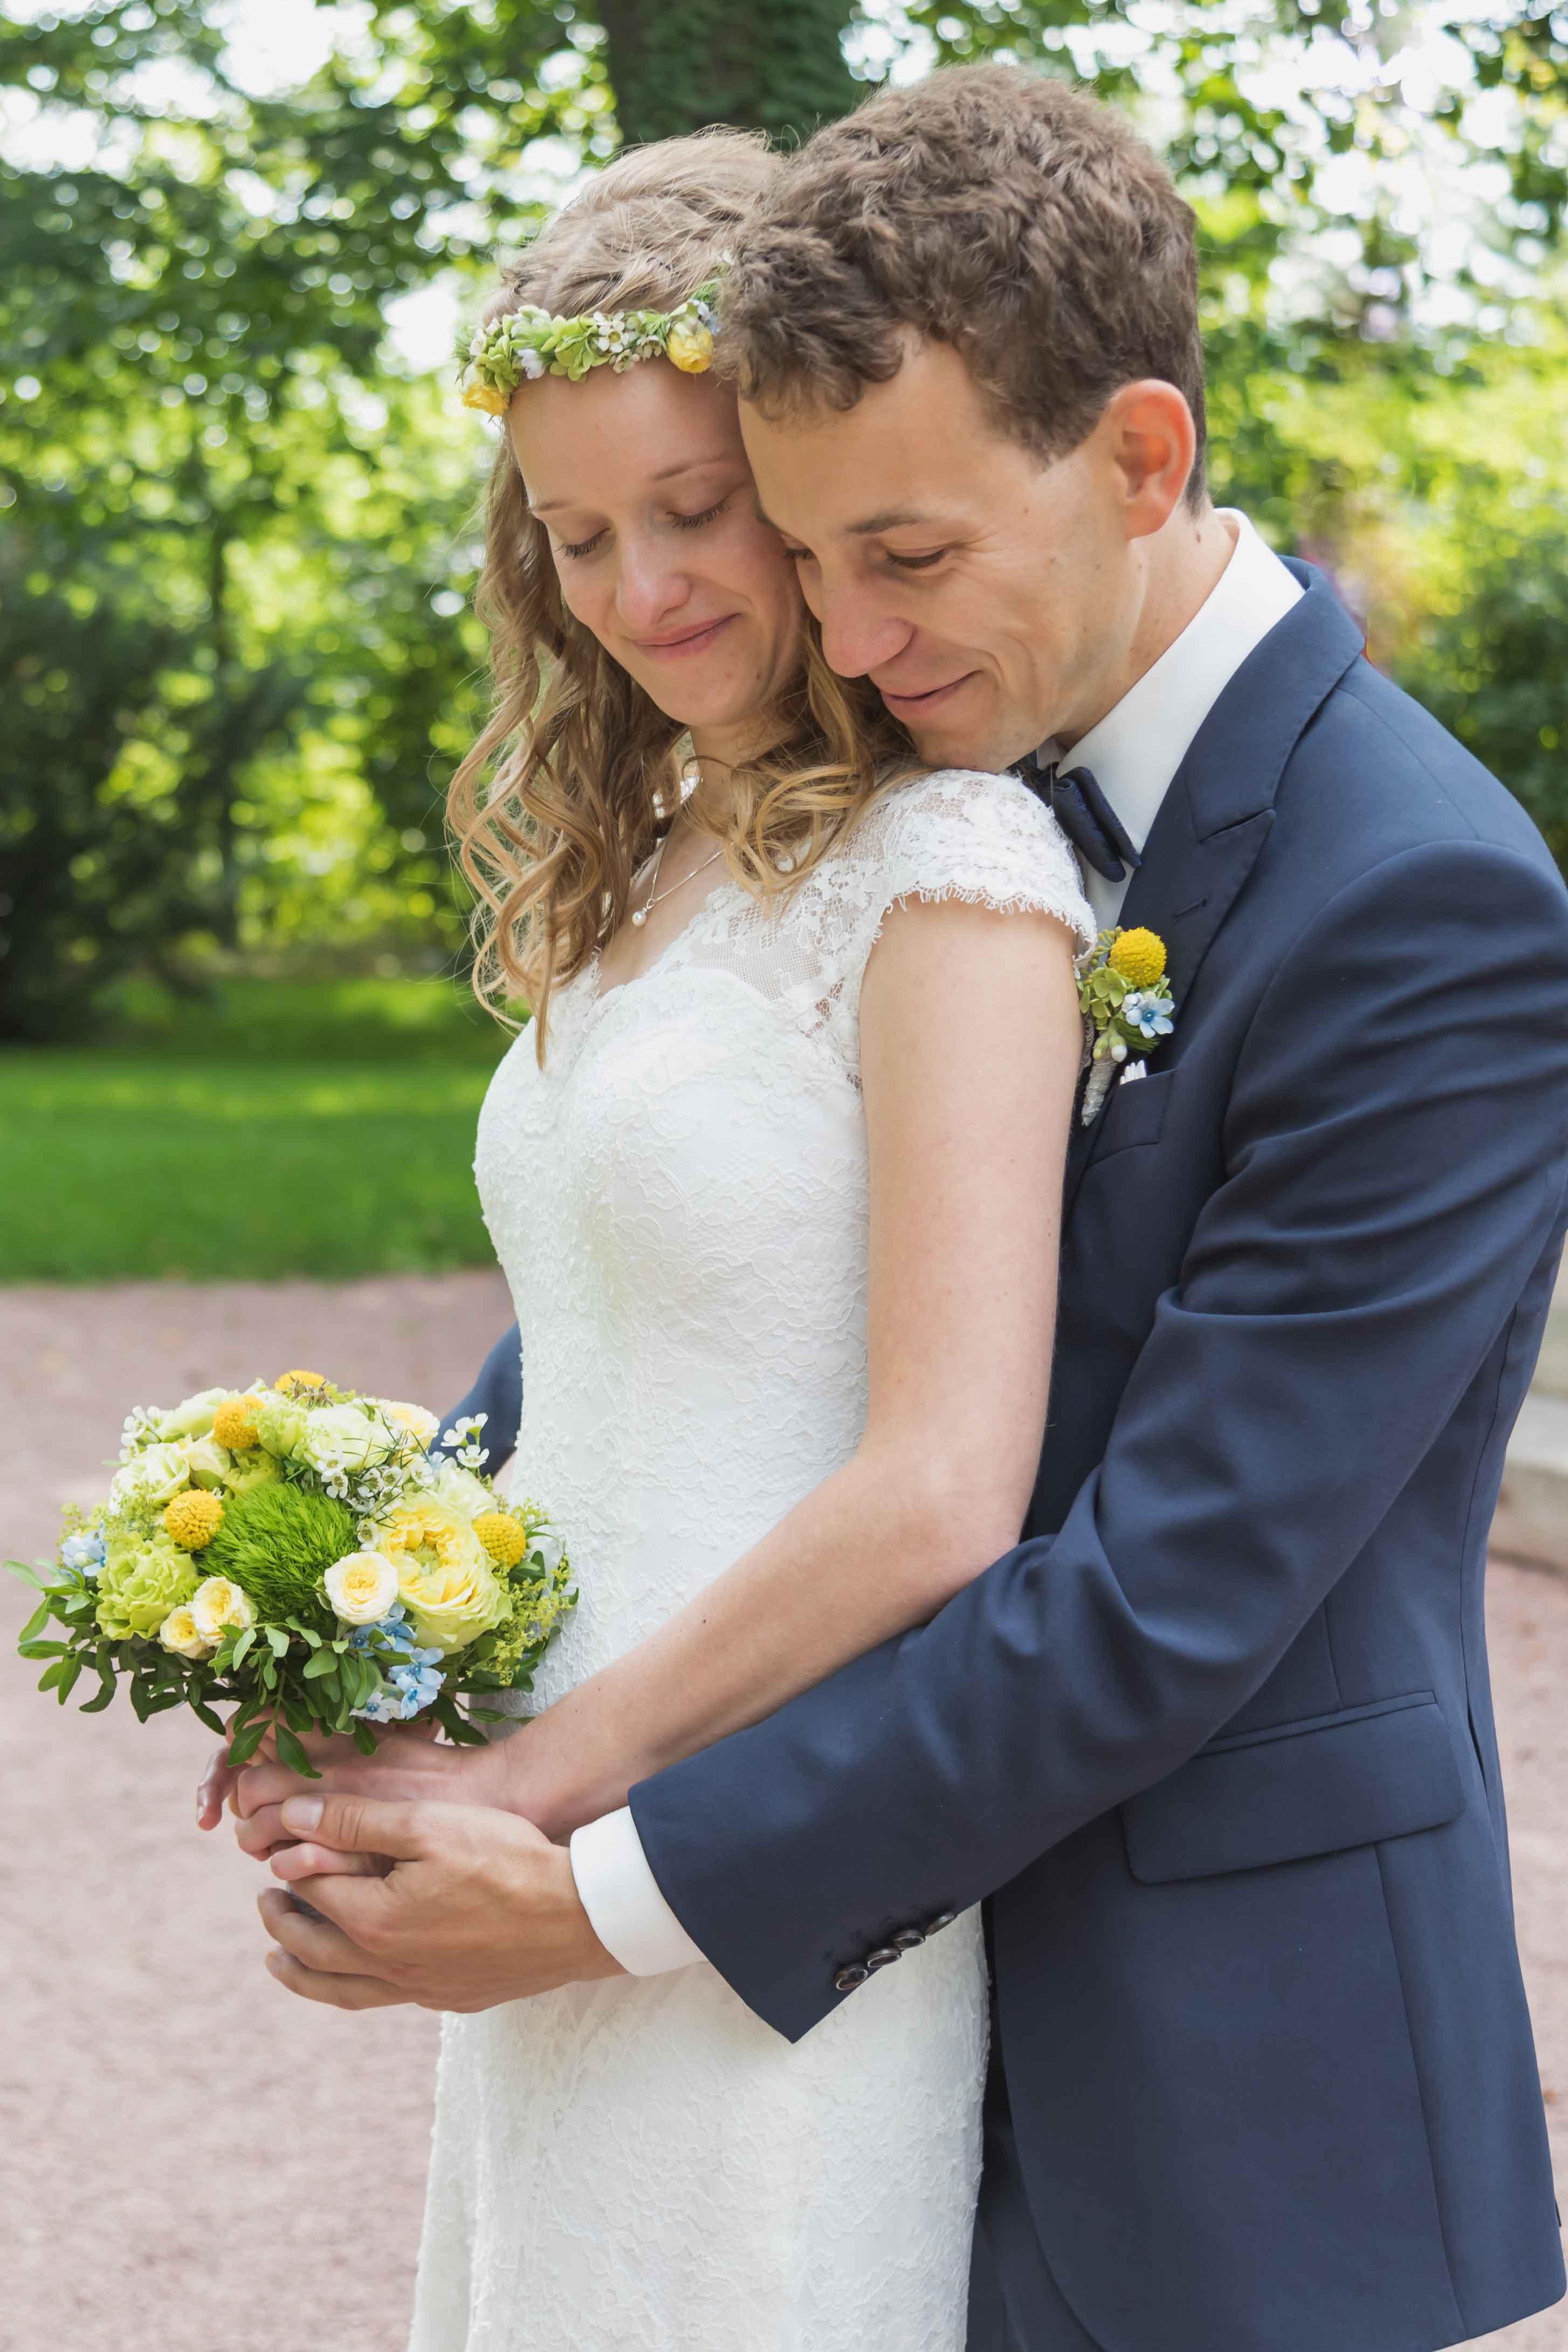 Hochzeit Fotoshooting Brautpaar Villa Teresa